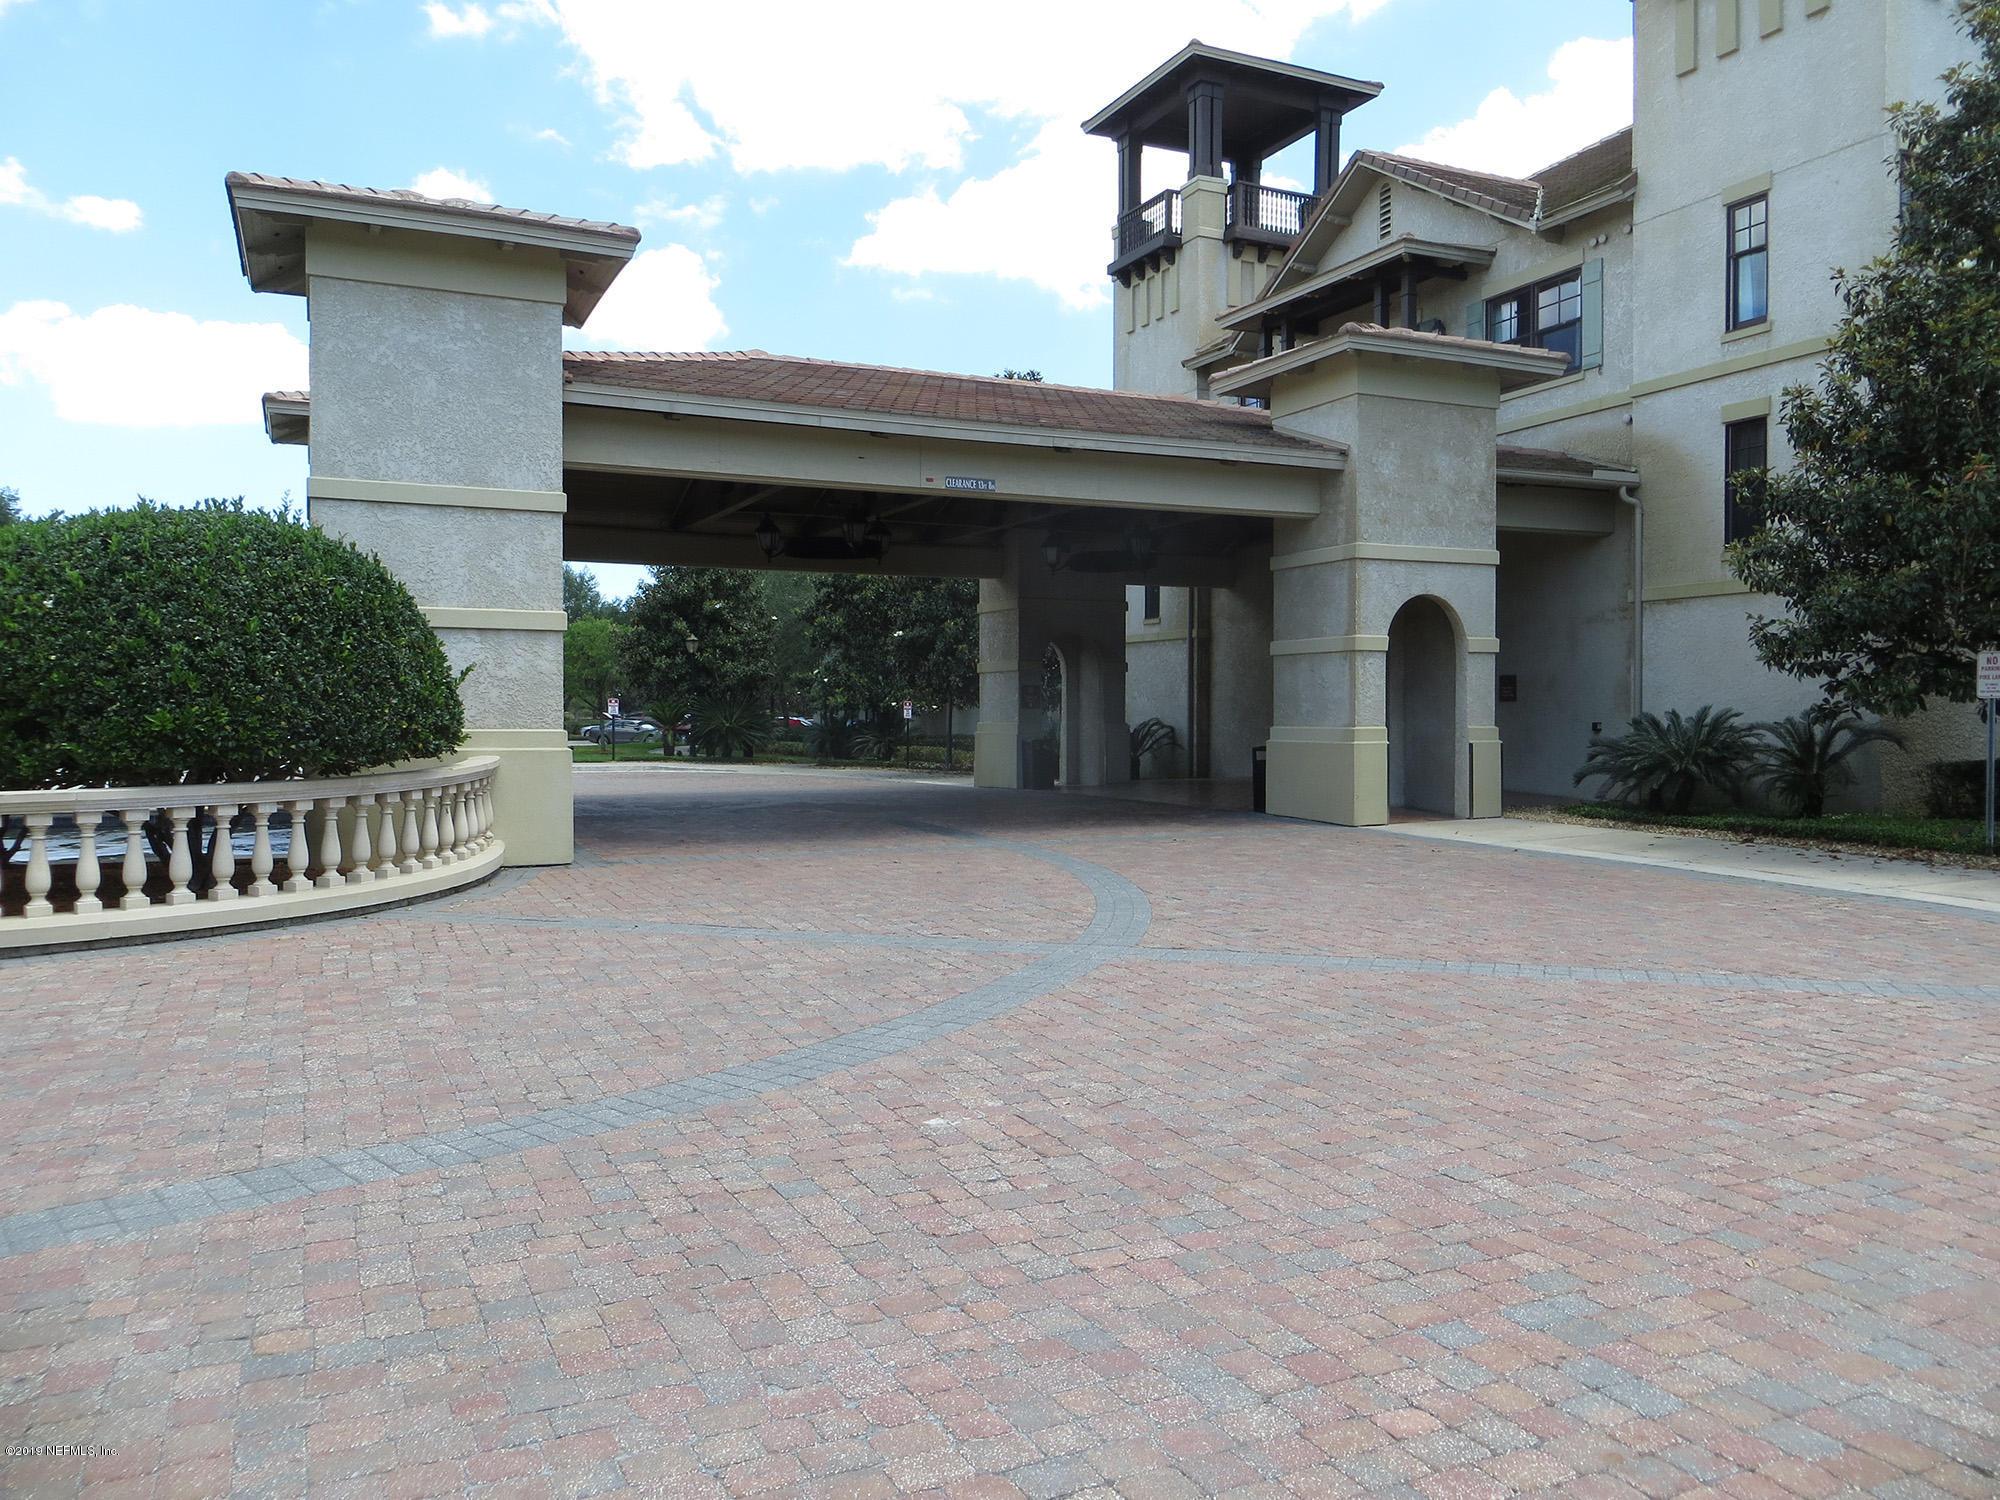 945 REGISTRY, ST AUGUSTINE, FLORIDA 32092, 1 Bedroom Bedrooms, ,1 BathroomBathrooms,Condo,For sale,REGISTRY,1010721